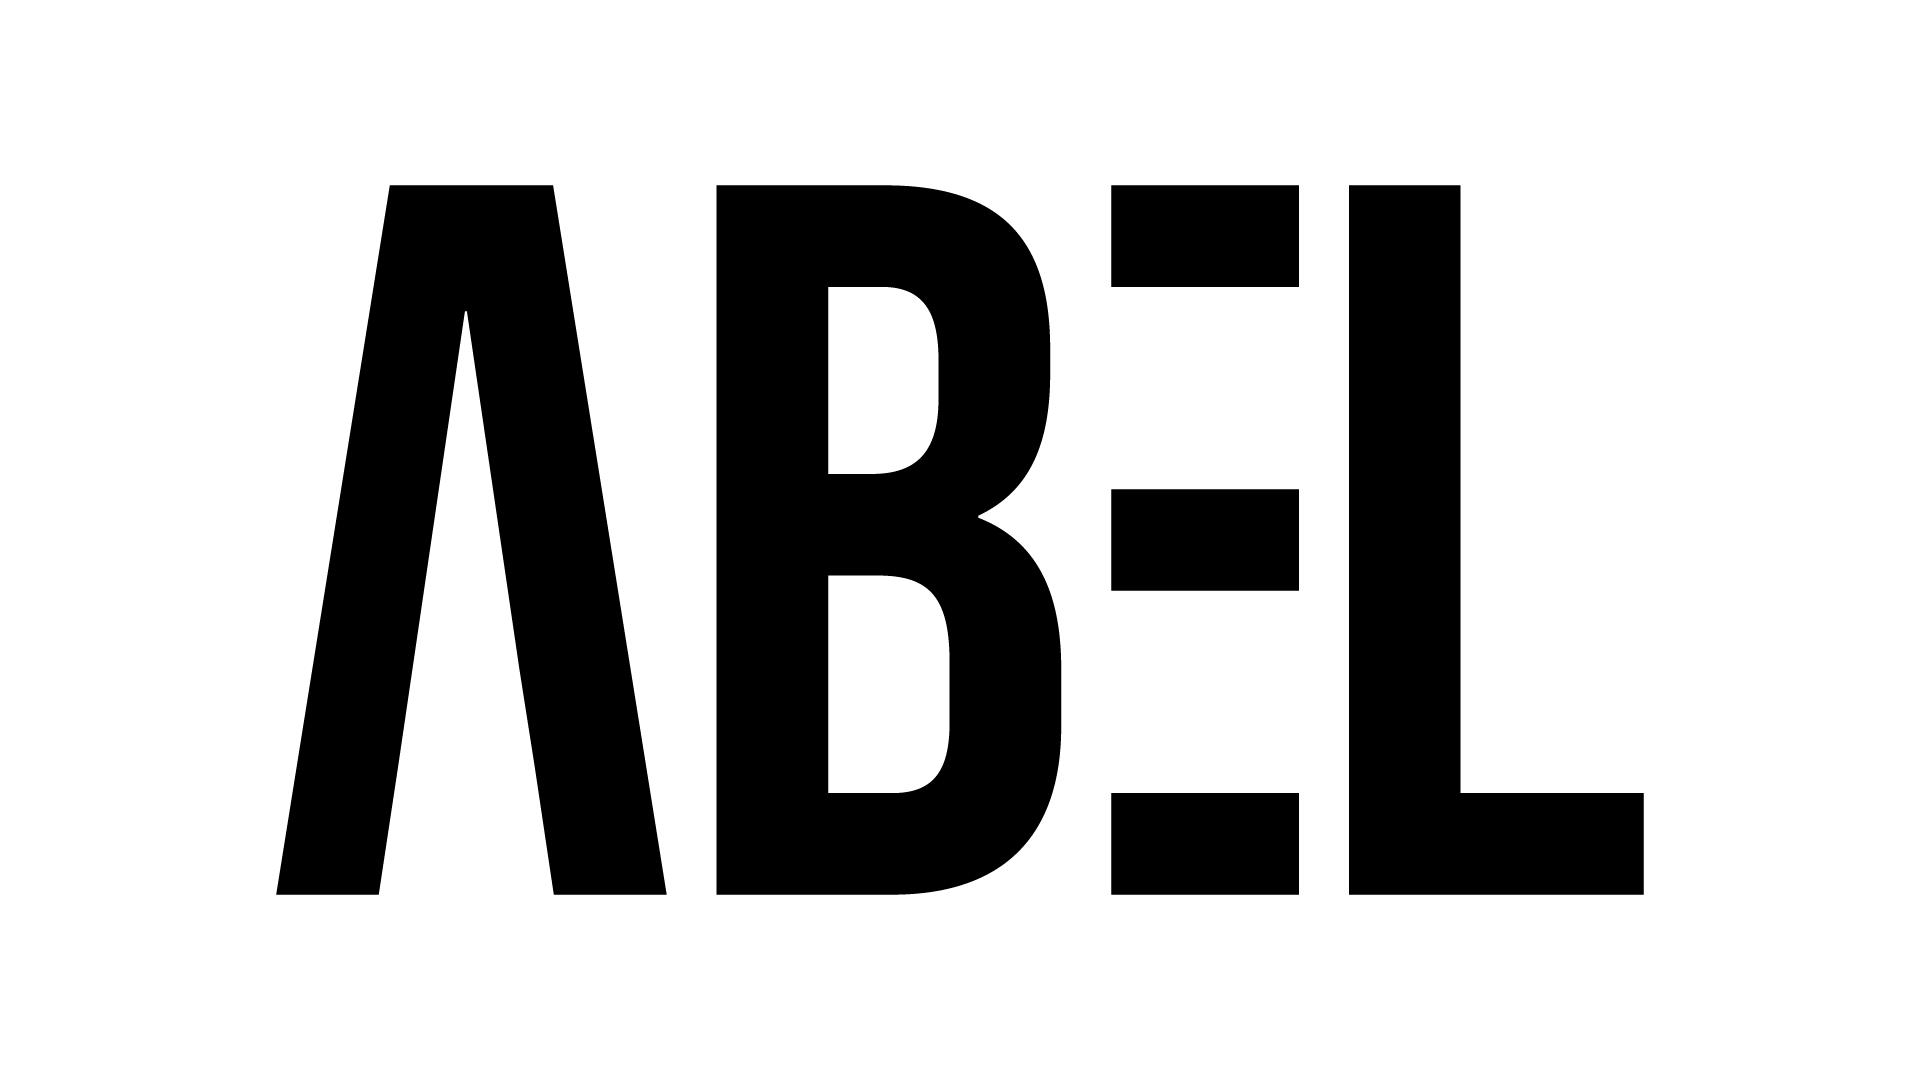 ABEL - empress music management